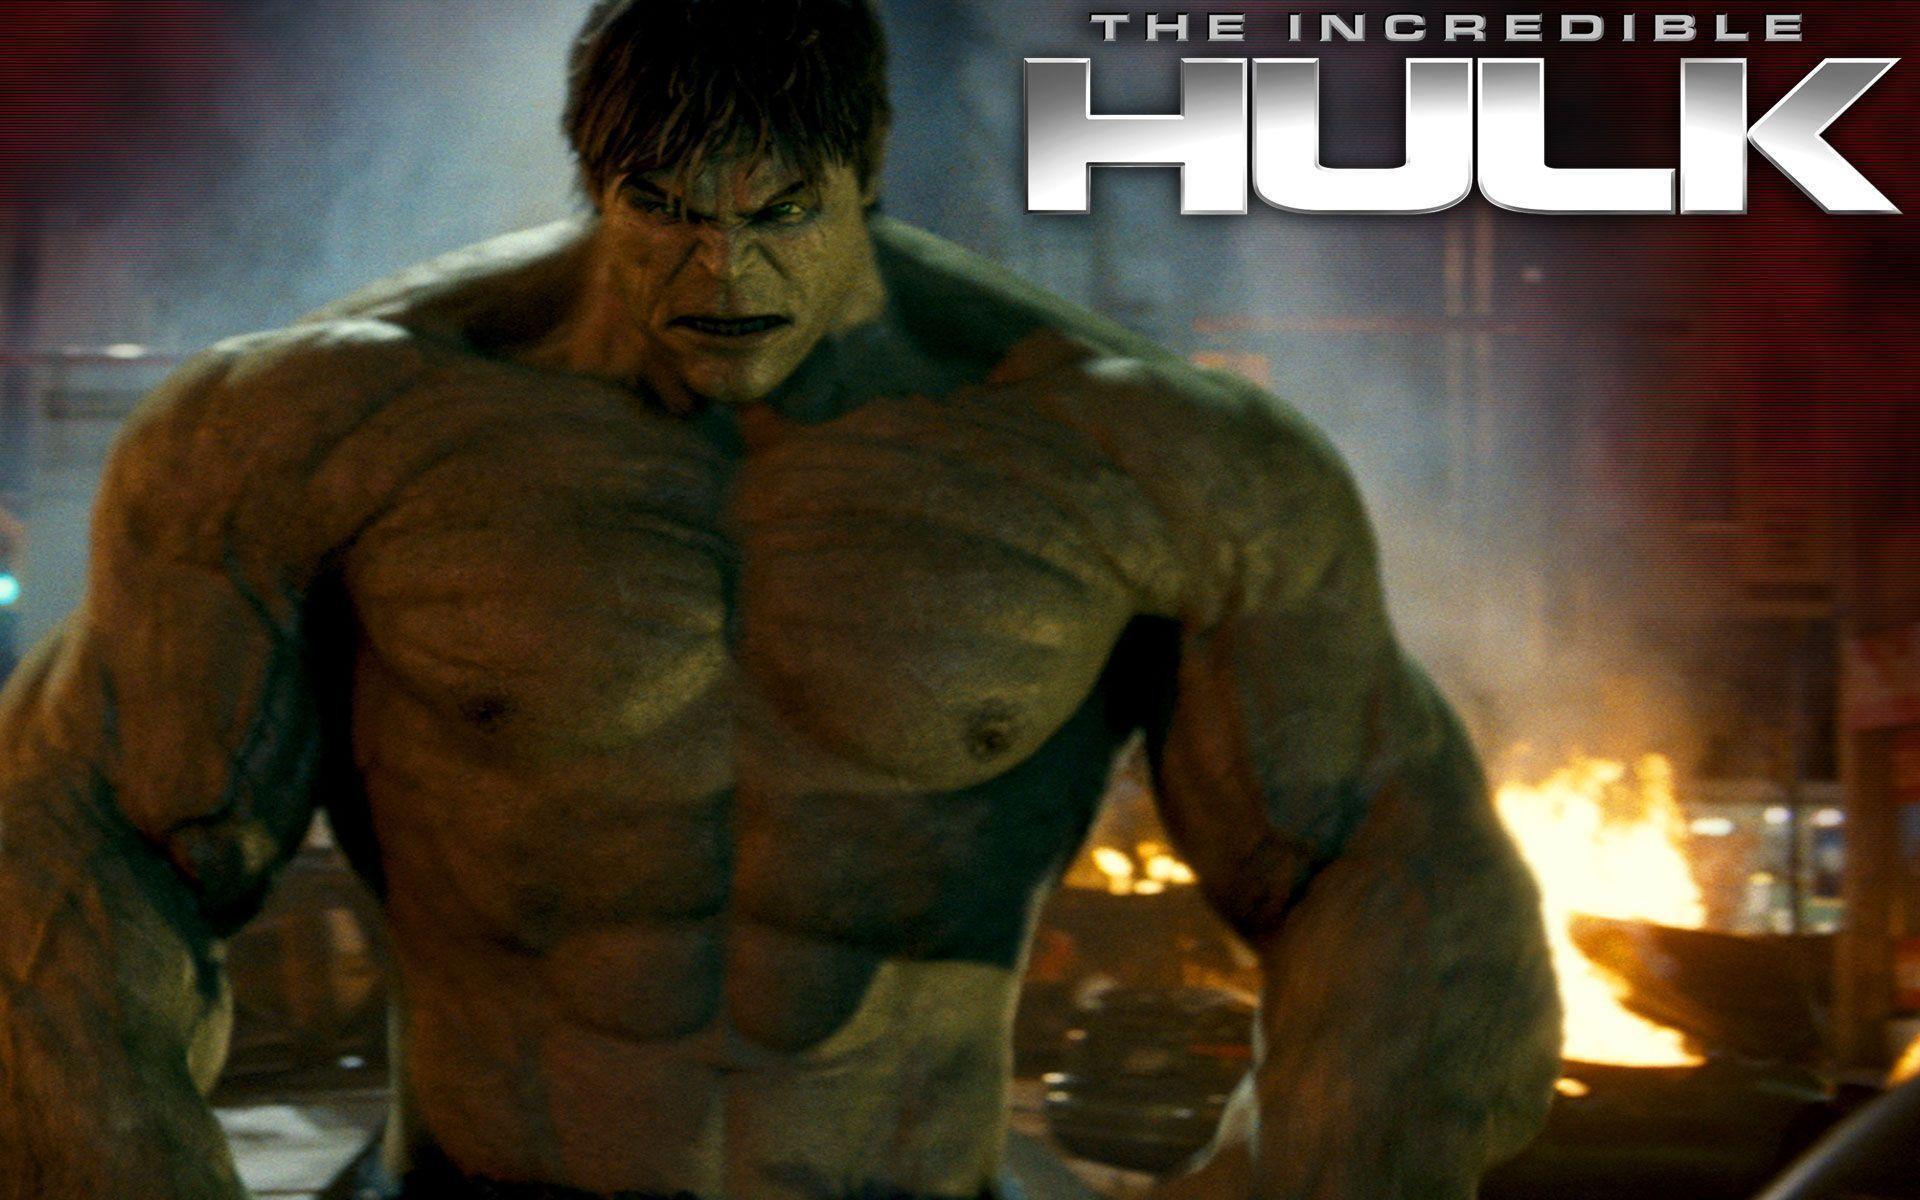 Hulk HD Wallpaper   Incredible Hulk Movie Wallpaper   Cool Wallpapers